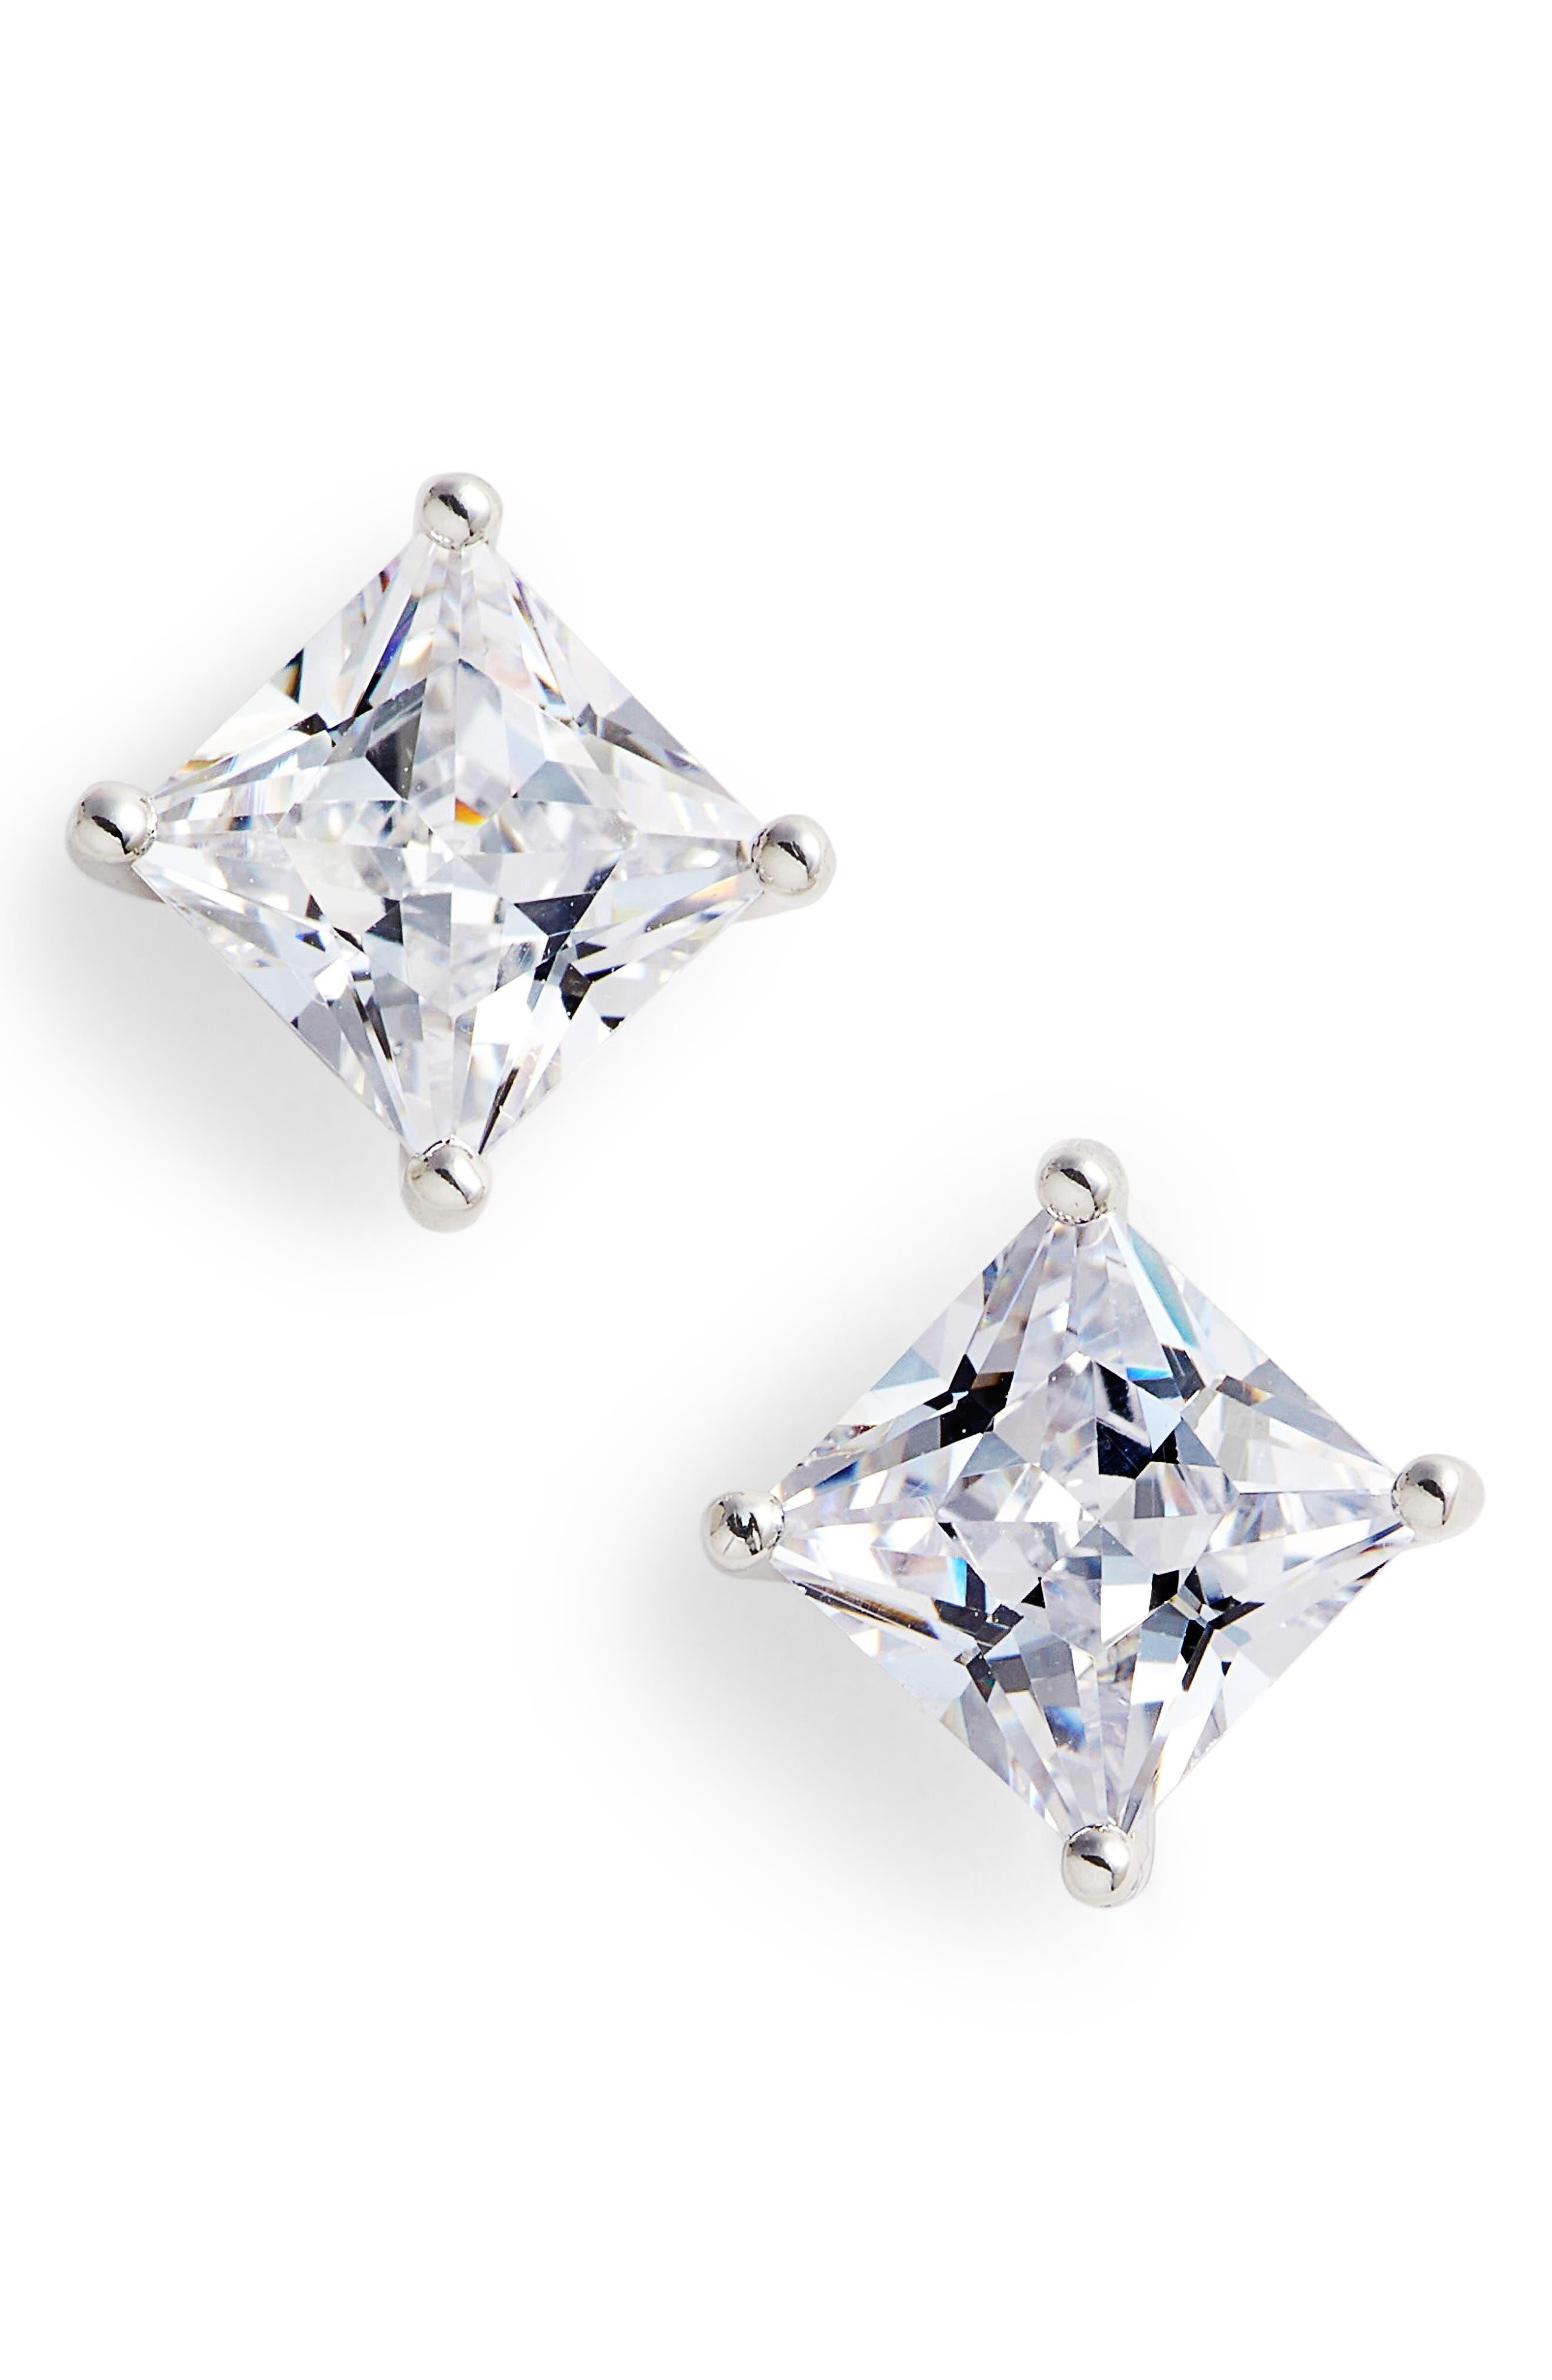 4ct tw Princess Cut Cubic Zirconia Stud Earrings,                             Main thumbnail 1, color,                             040